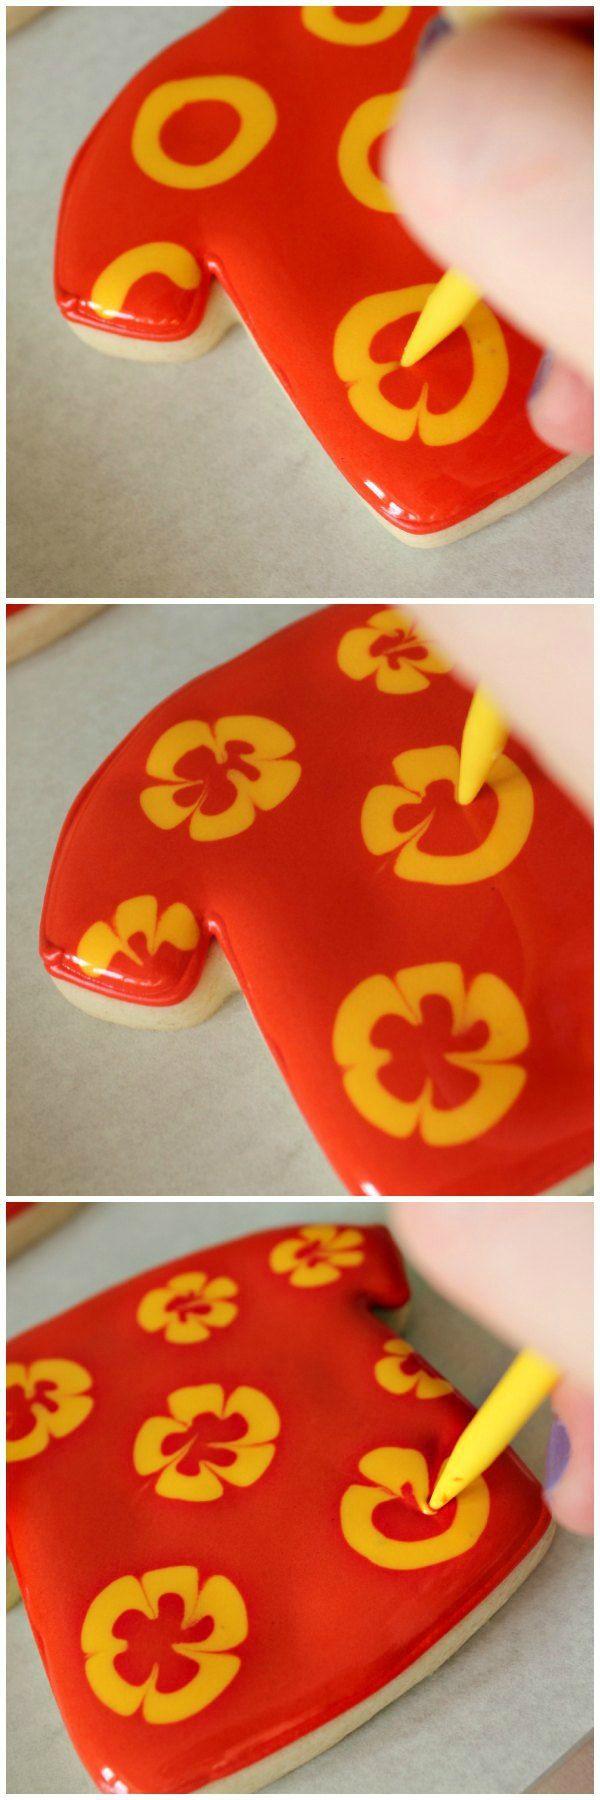 Hawaiian Shirt Cookies-so cute for a Luau party!